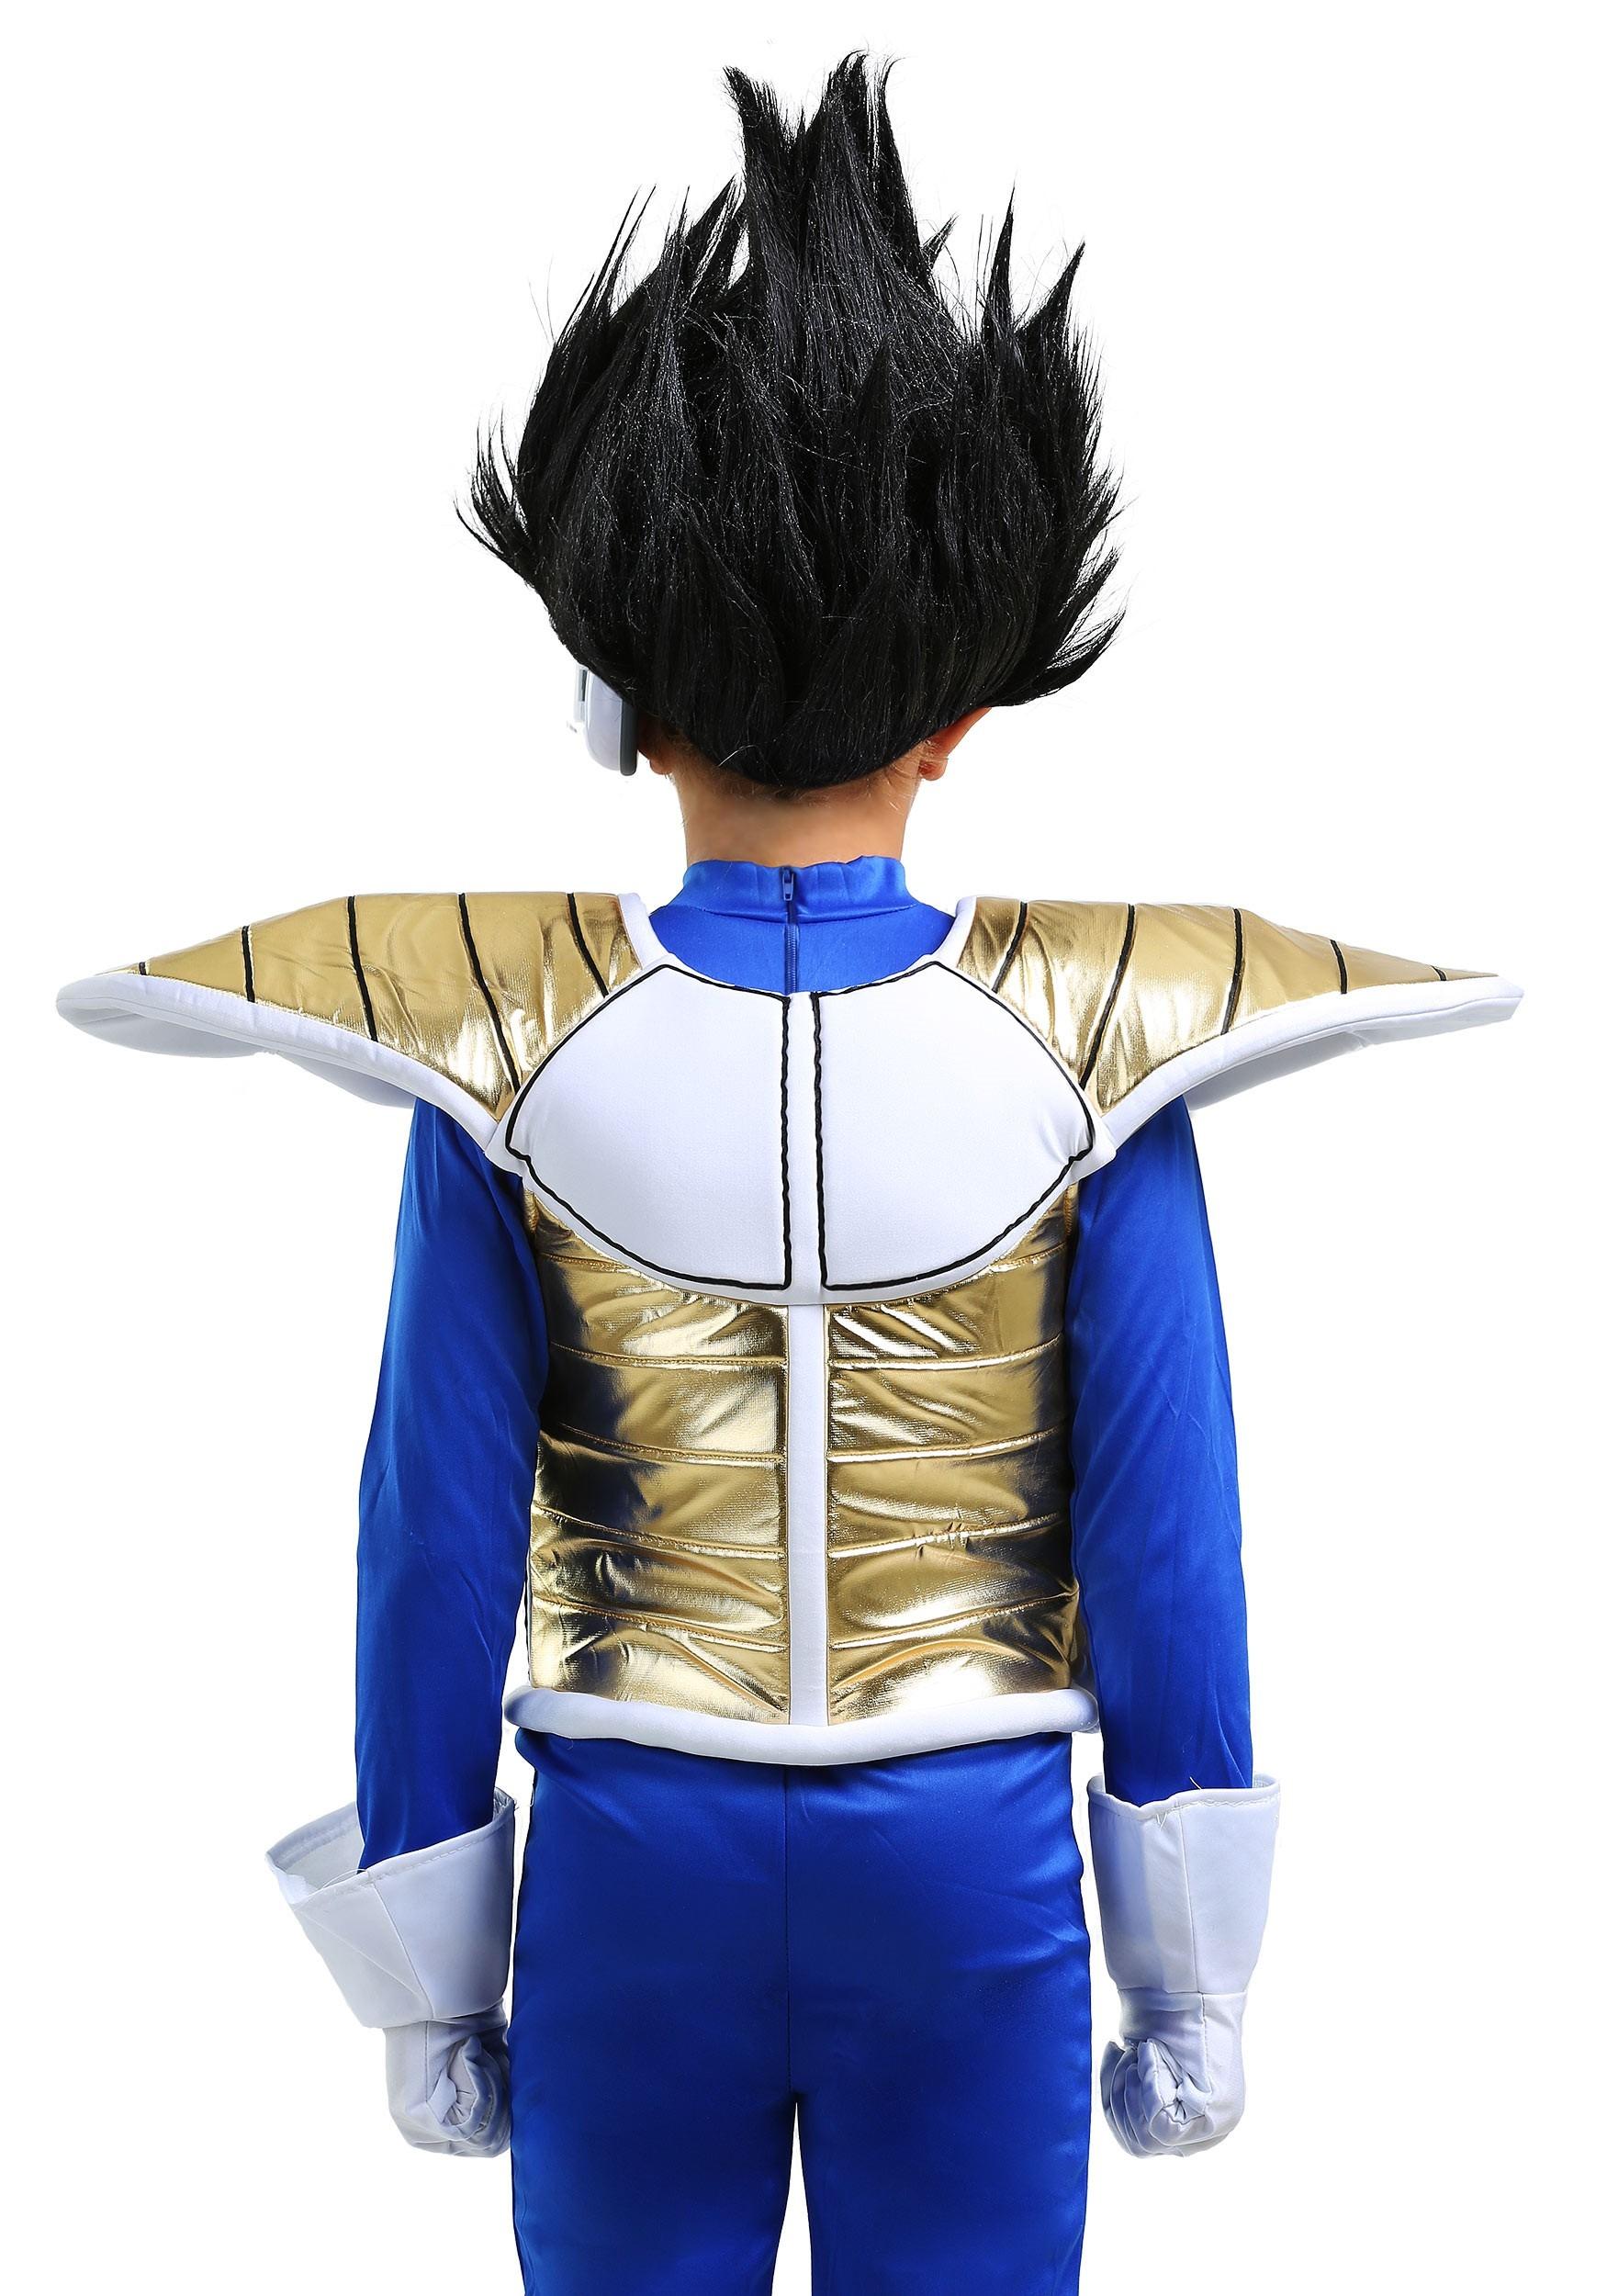 Dragon Ball Z Saiyan Armor Accessory For Kids Forums → games → dragon ball z. child dragon ball z saiyan armor accessory